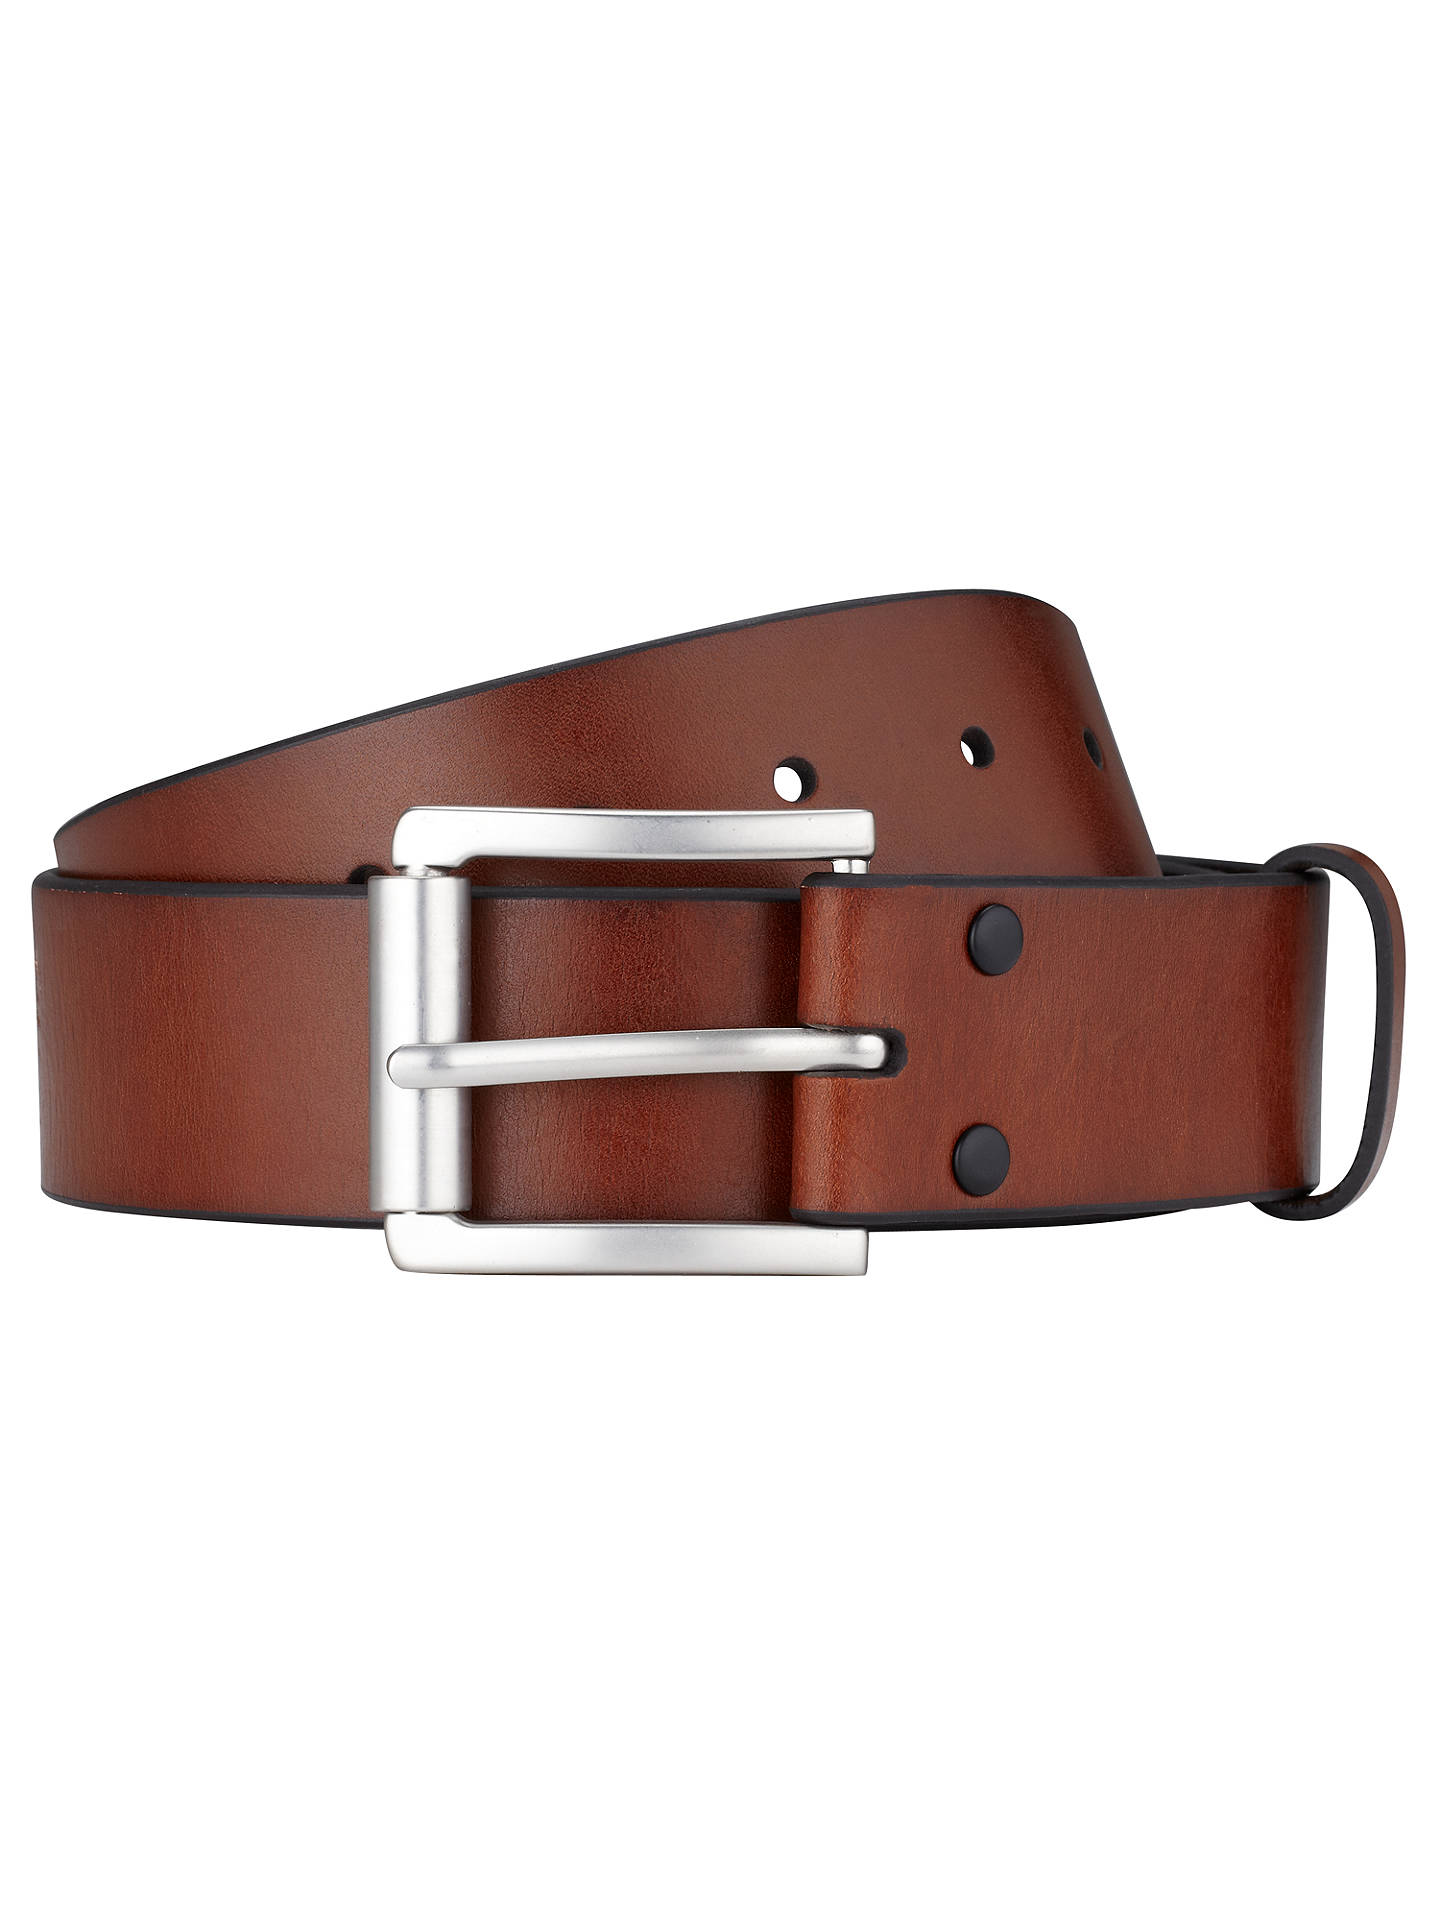 Kin By John Lewis Reversible Belts Mens Accessories Blue Brown Chrimson